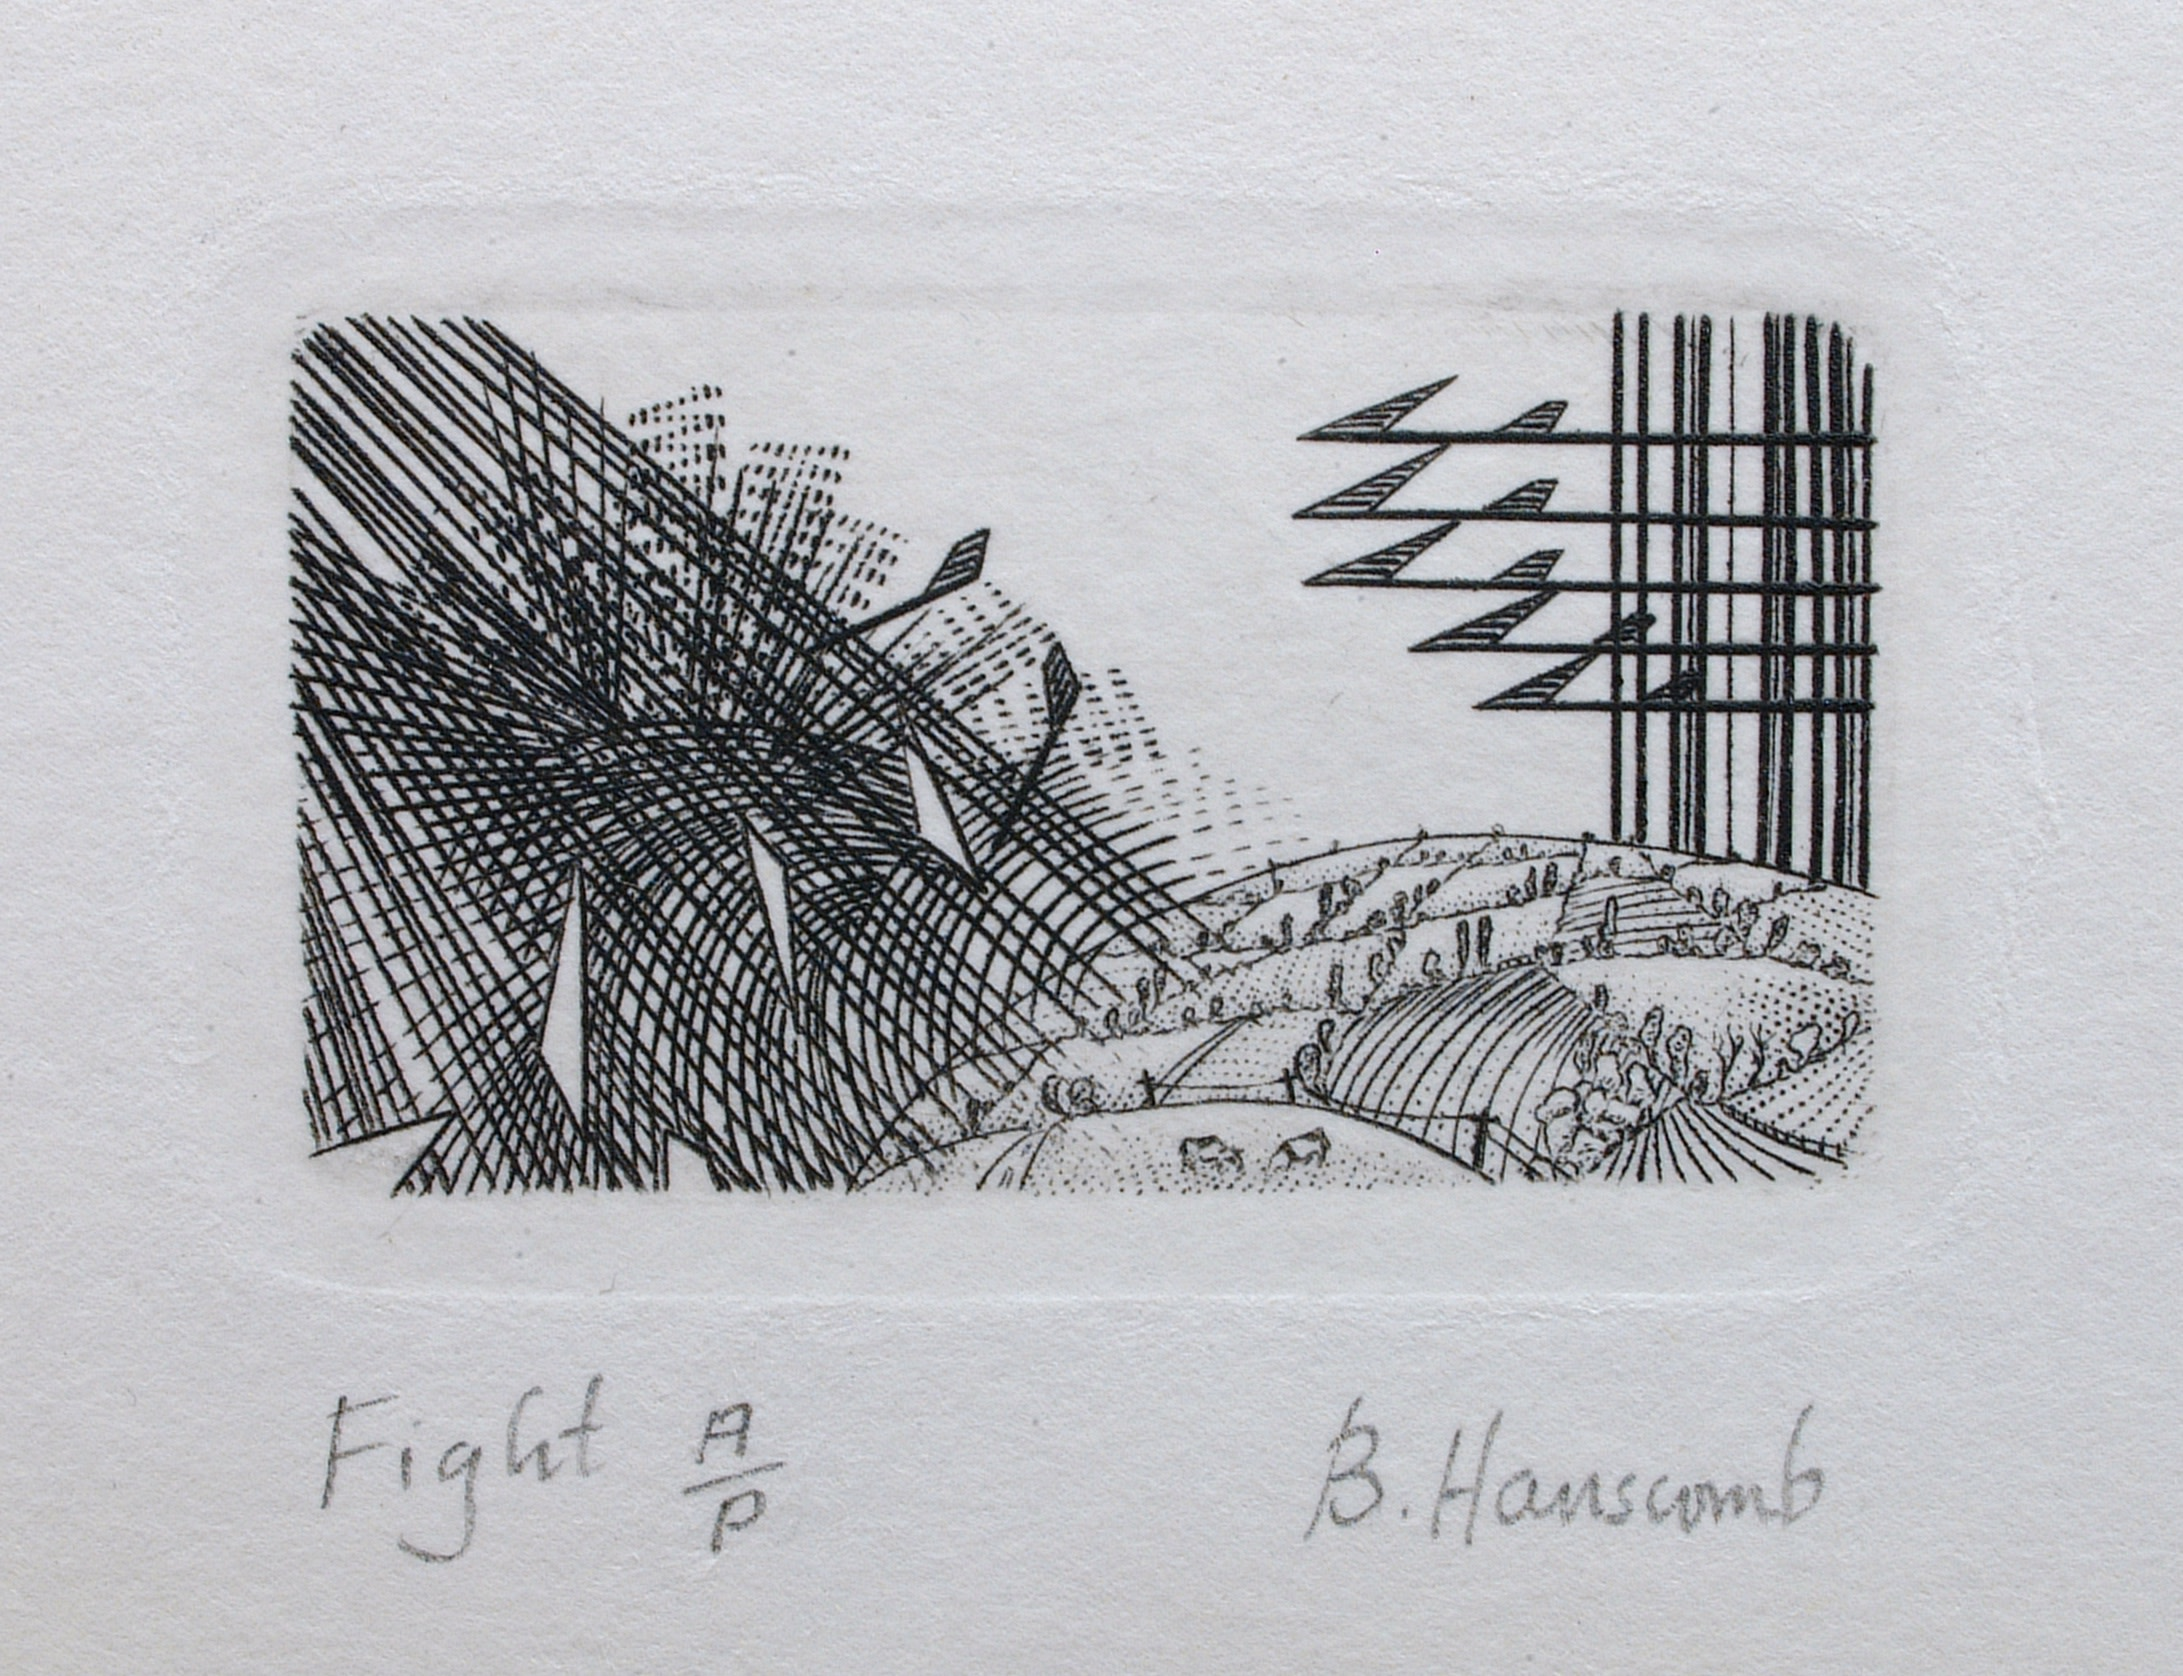 "<span class=""link fancybox-details-link""><a href=""/exhibitions/21/works/artworks_standalone10941/"">View Detail Page</a></span><div class=""artist""><span class=""artist""><strong>Brian Hanscomb RE</strong></span></div><div class=""title""><em>Fight</em></div><div class=""medium"">copperplate engraving</div><div class=""dimensions"">21 x 24cm framed<br>2.7 x 4.5cm image</div><div class=""edition_details"">edition of 100</div>"